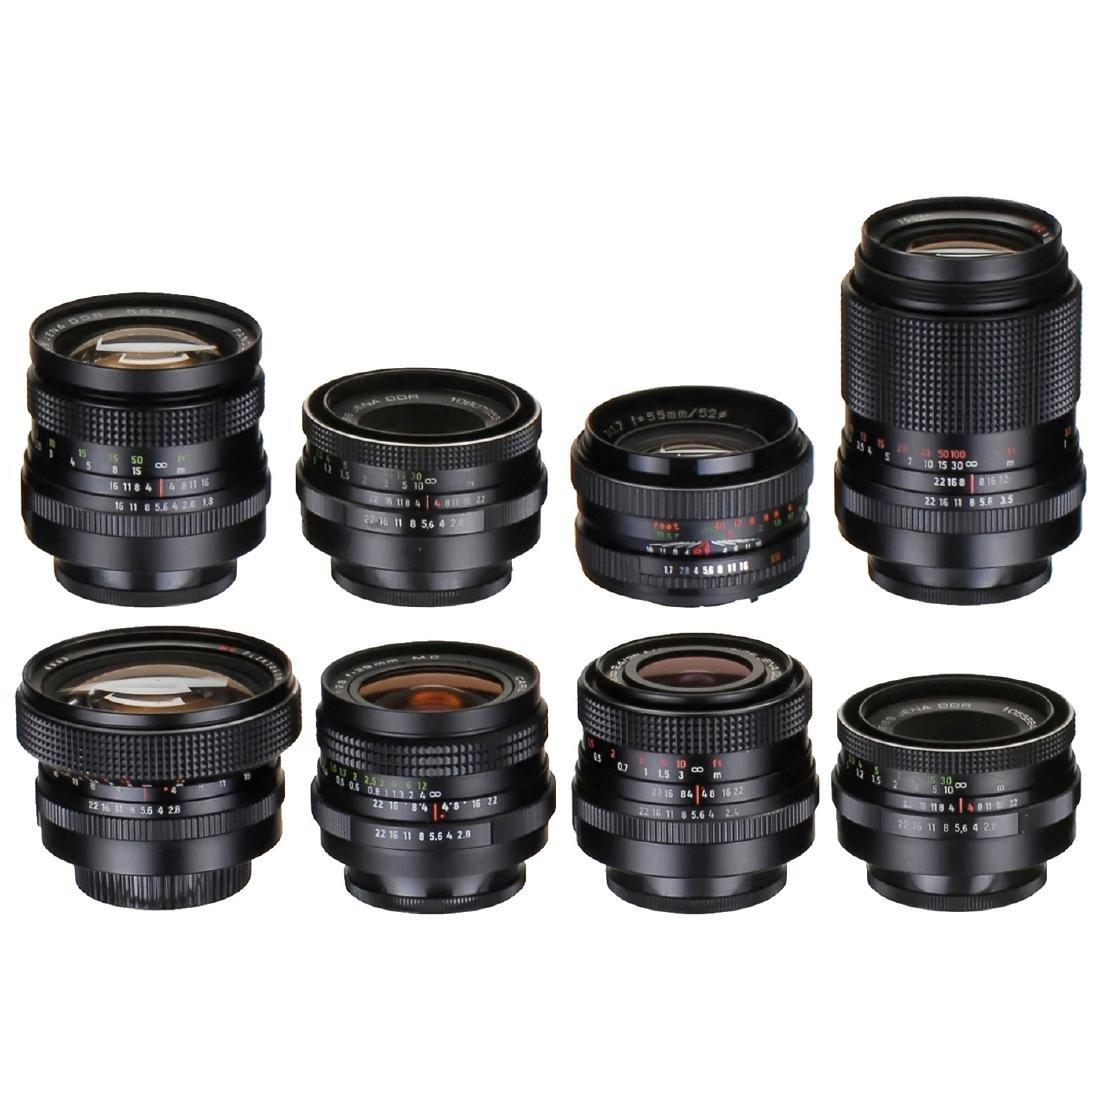 7 Zeiss Jena Lenses (M42 Screw-Mount)